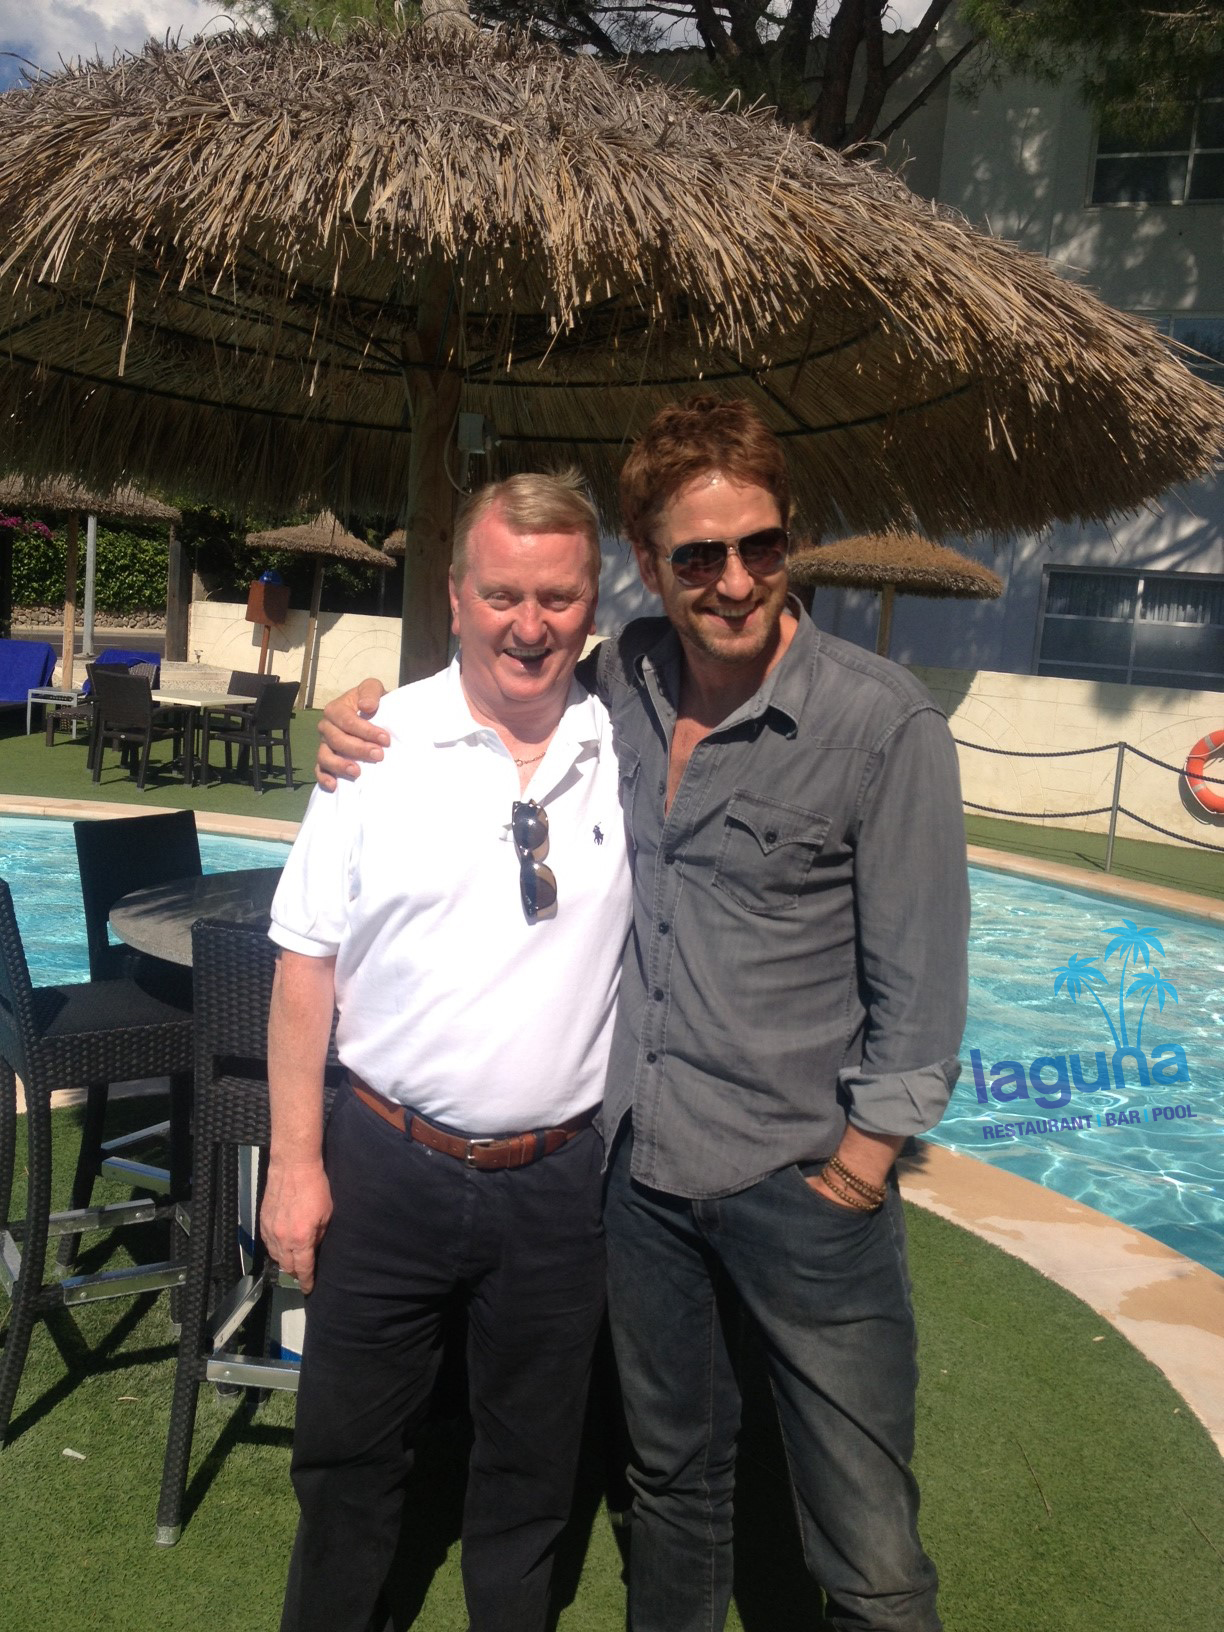 Gerard Butler in Laguna Puerto Pollensa with Jim McSorley